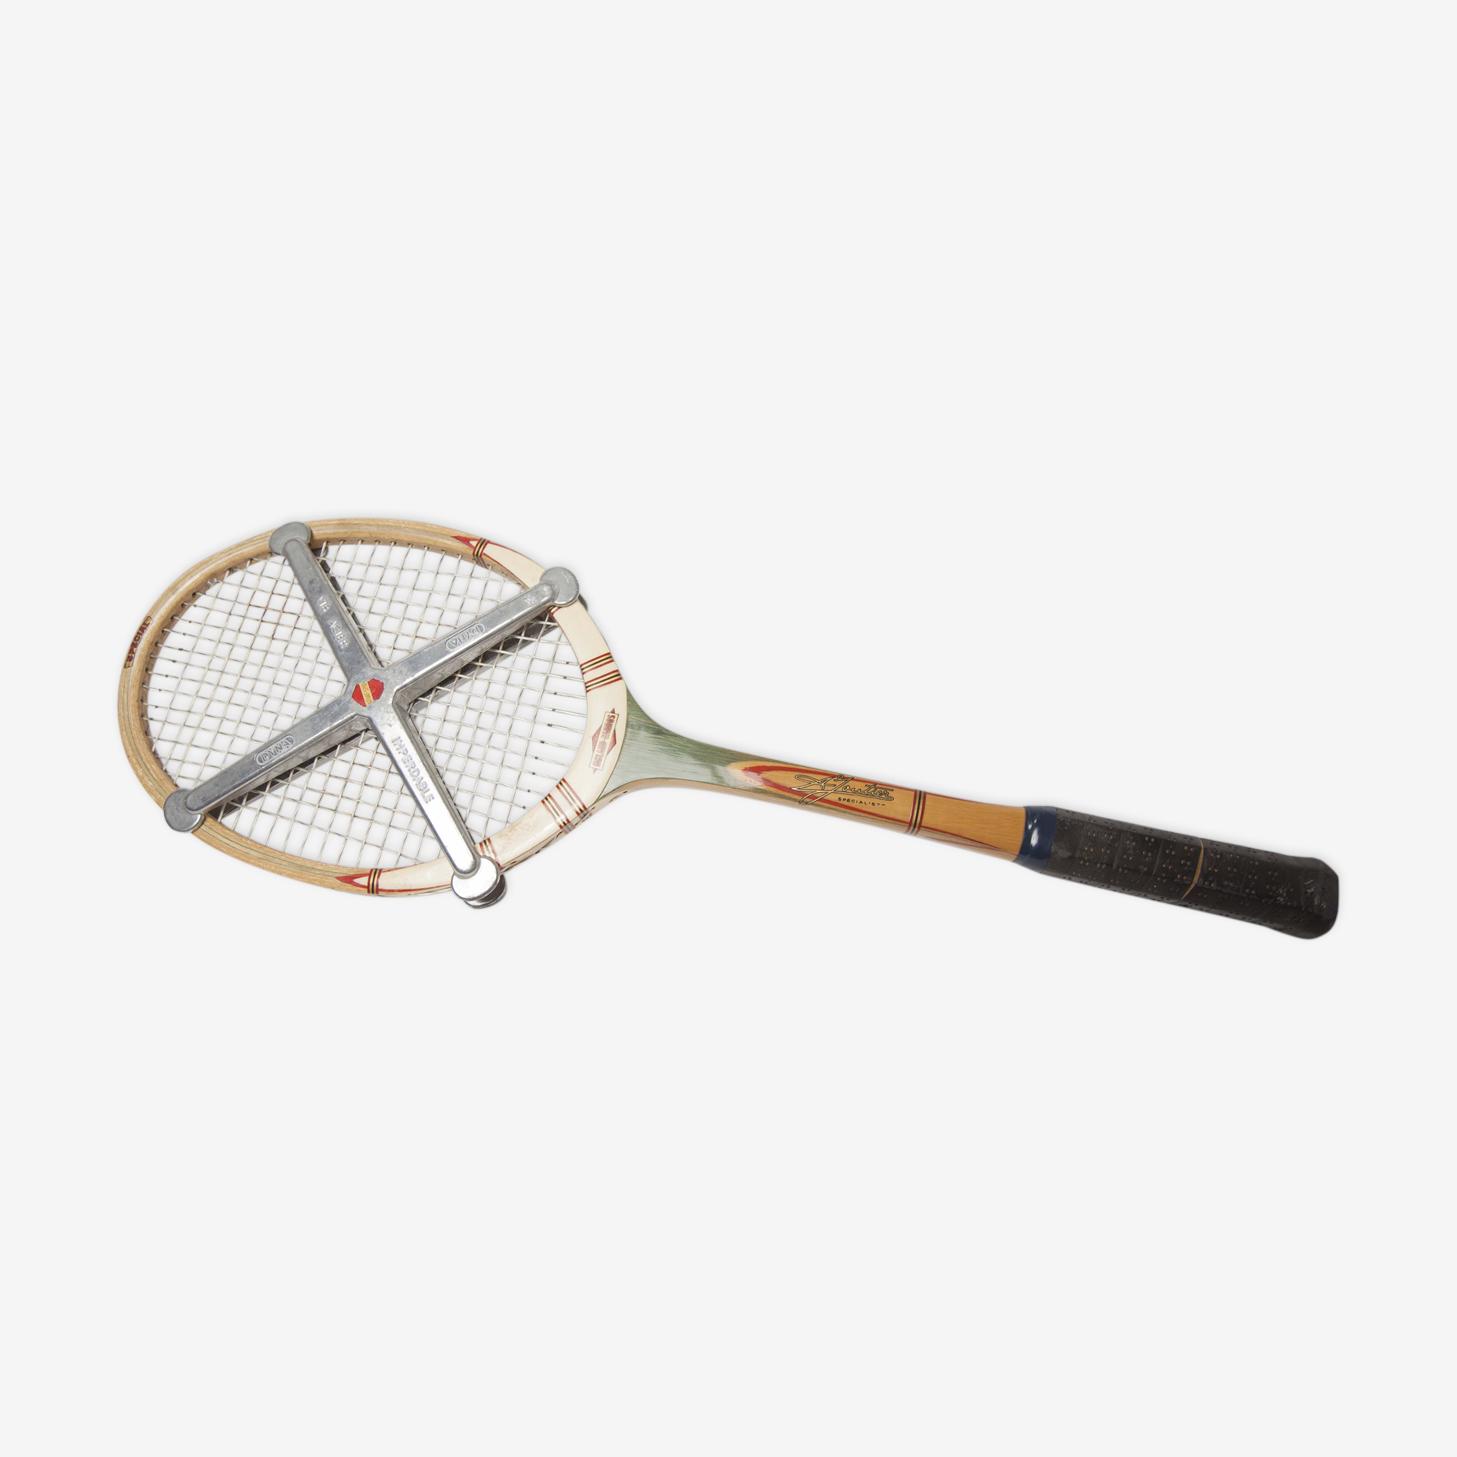 Raquette professionnelle de tennis Rolland Garros Super Championship Model